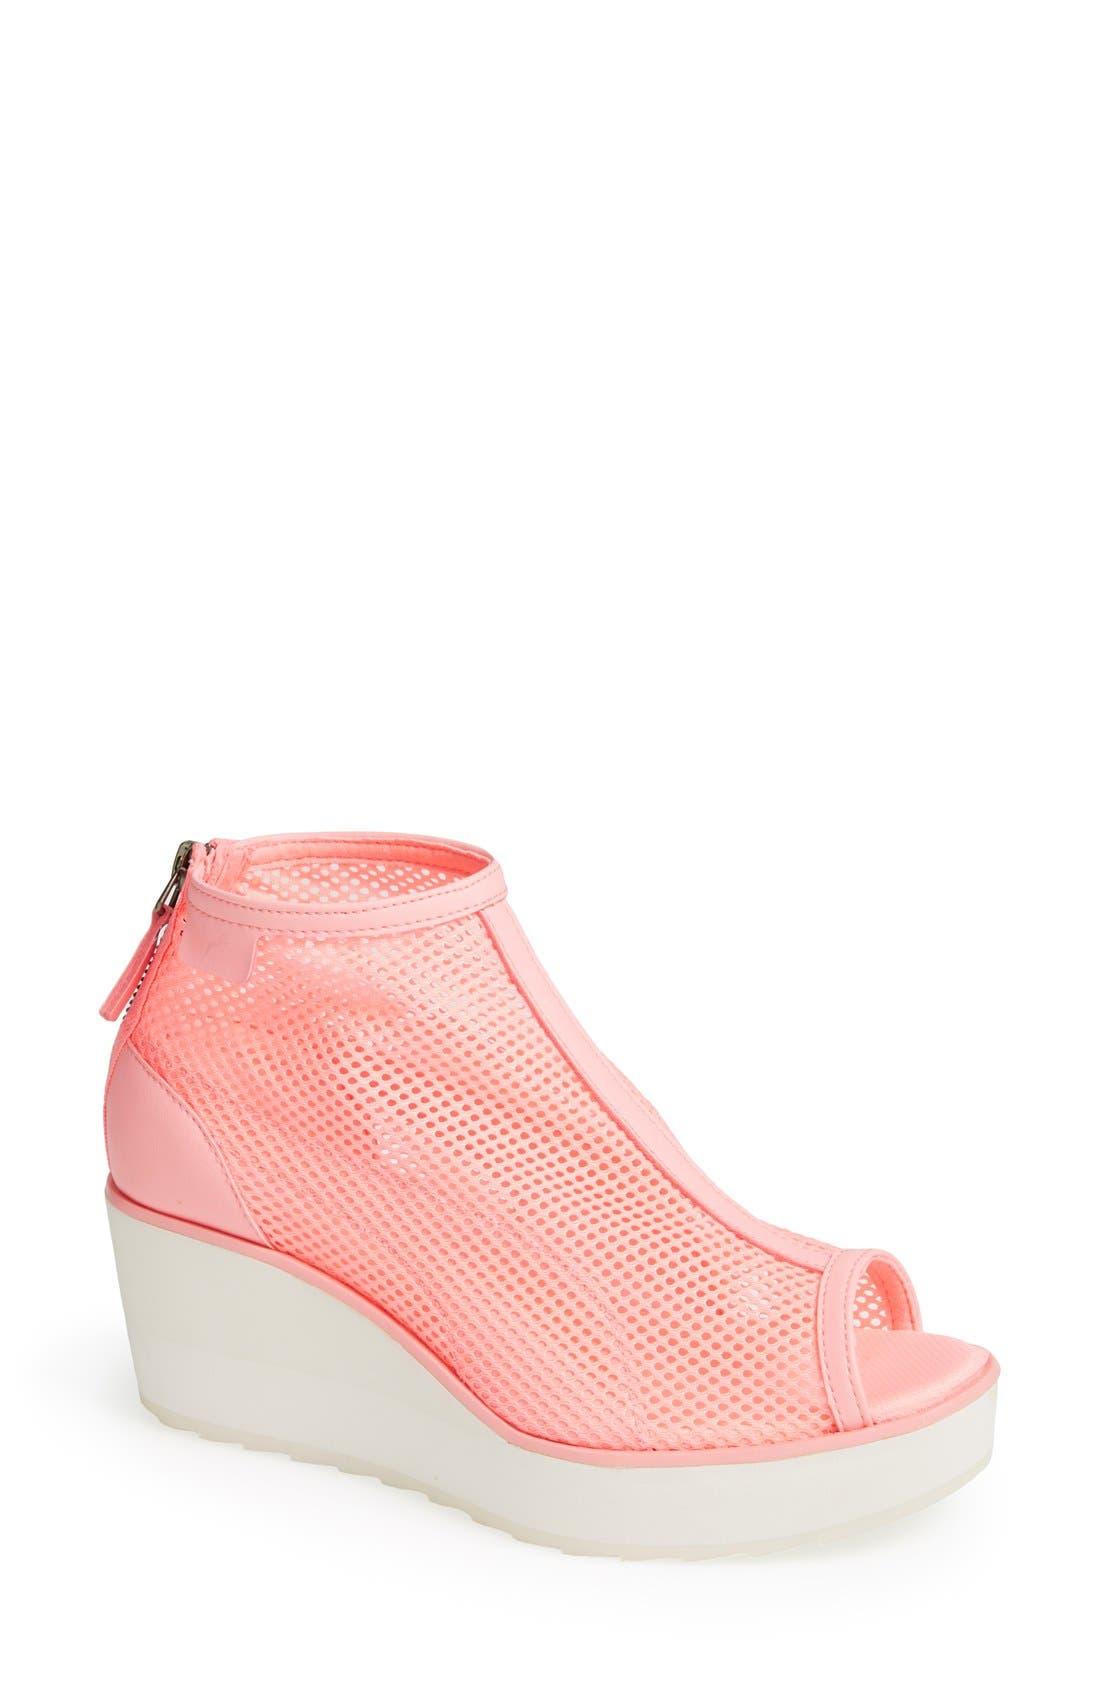 Alternate Image 1 Selected - PUMA by Hussein Chalayan 'Hakkoda' Open Toe Wedge Sneaker